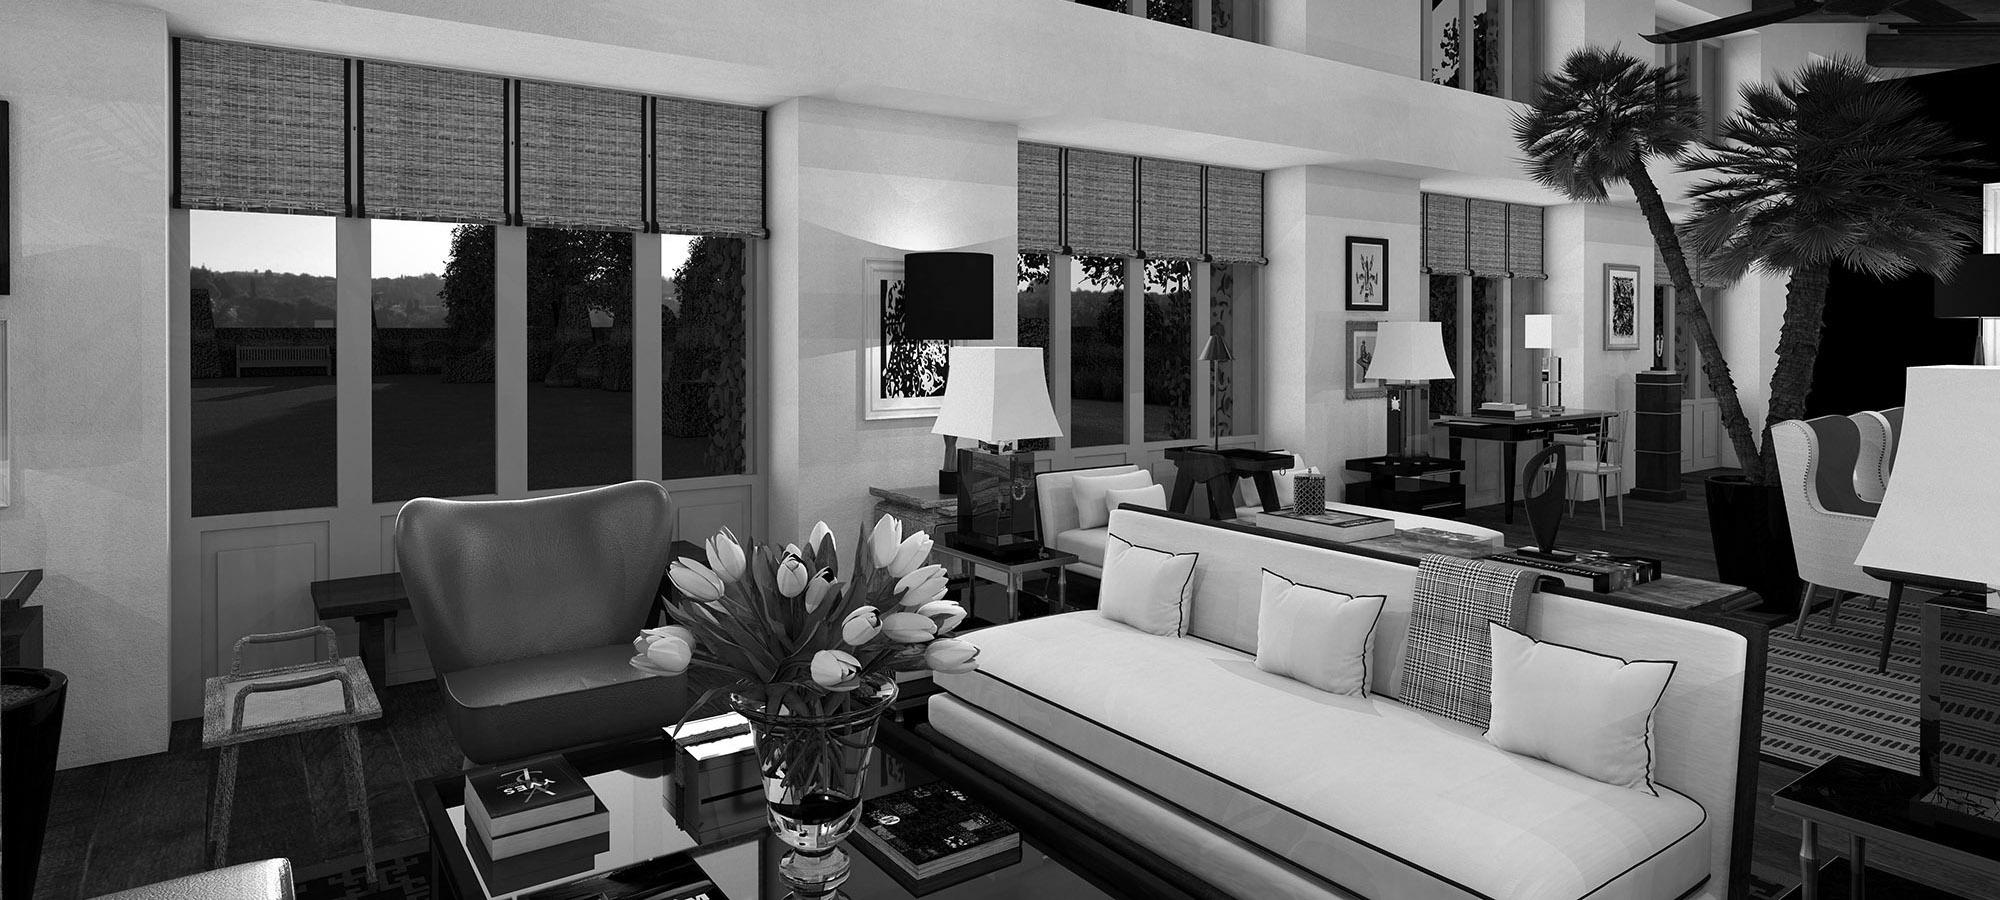 michele-bonan-interiors-showroom-5-bw-1